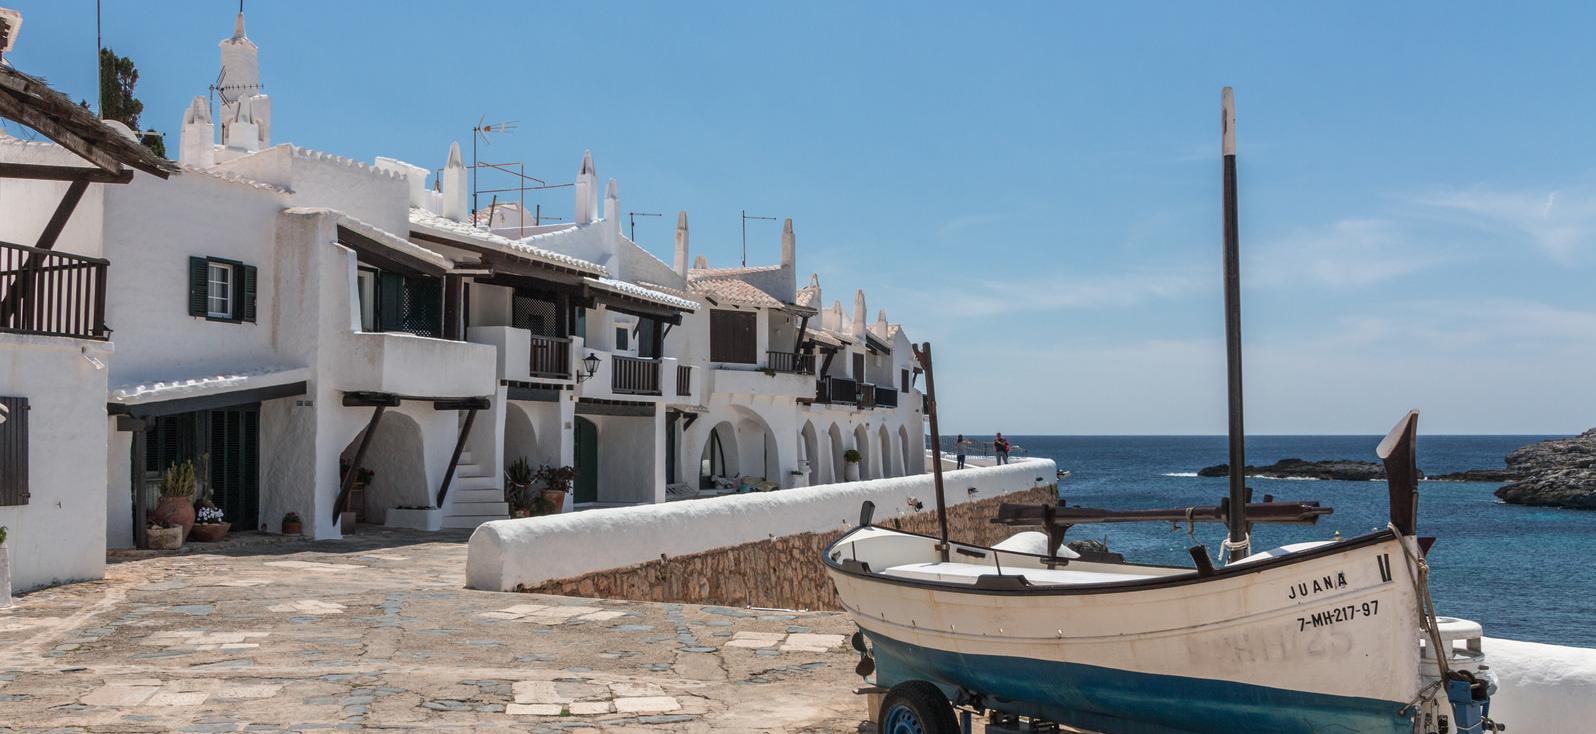 Binibeca, un lugar de postal